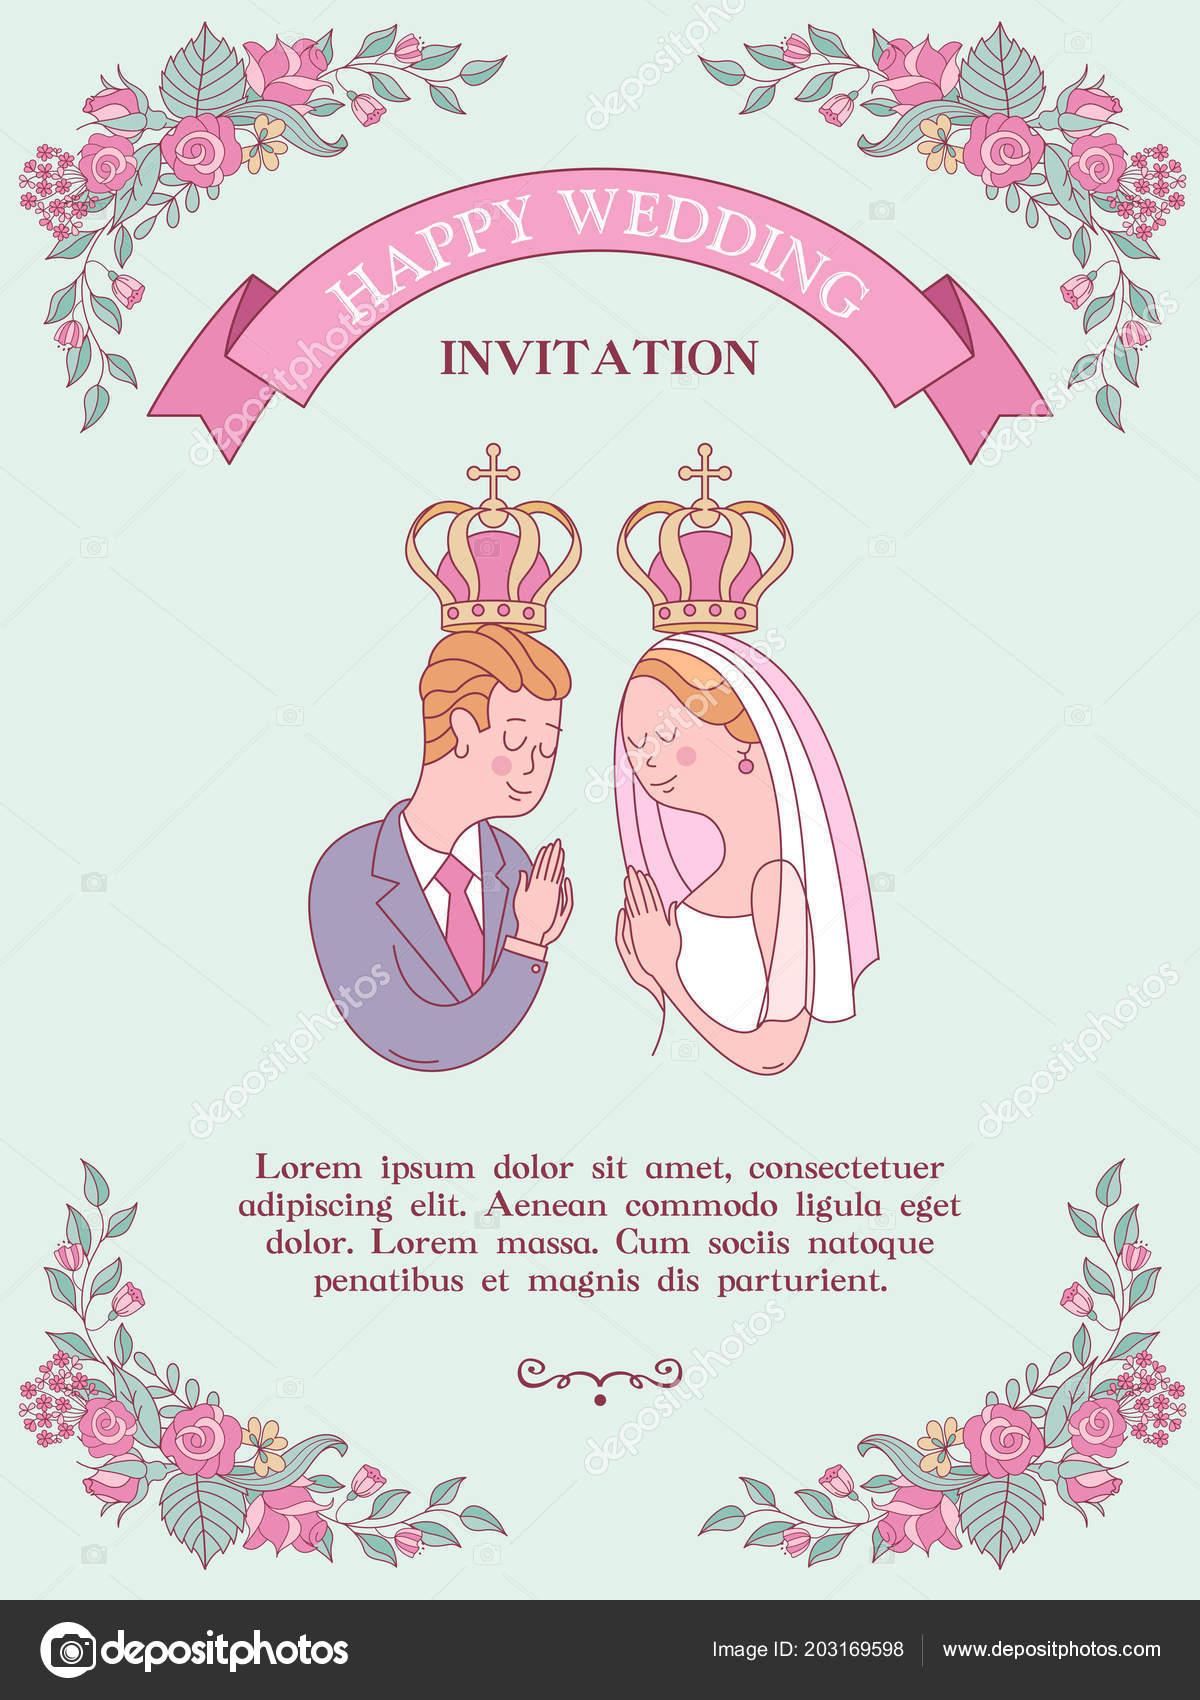 Wedding invitation wedding card wedding church bride groom wedding wedding invitation wedding card wedding church bride groom wedding crowns vetor de stock stopboris Images